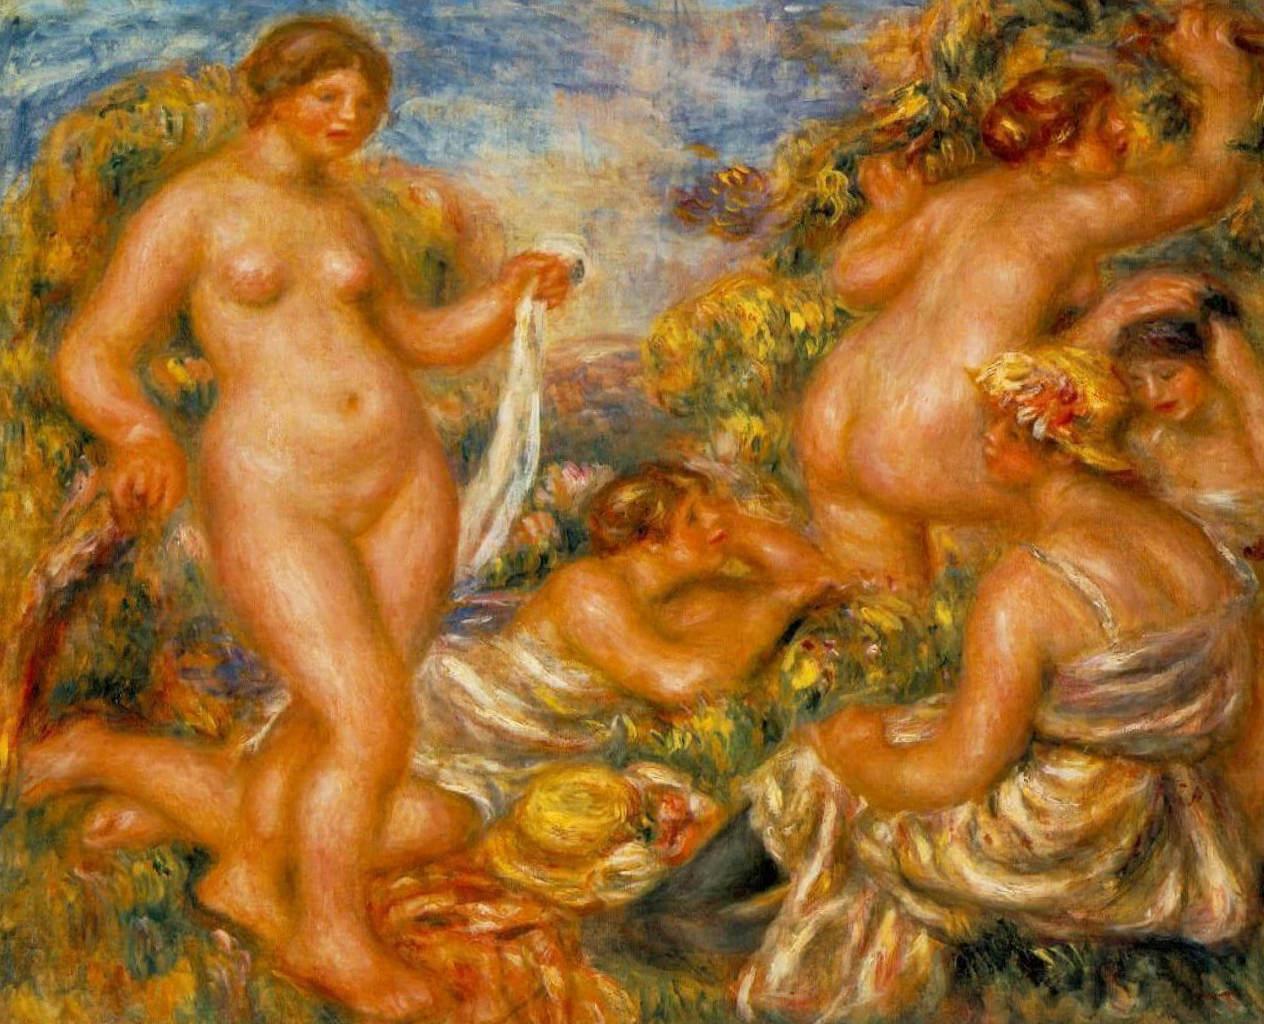 Купальщицы - Пьер Огюст Ренуар ( 1918—1919, Музей д'Орсэ, Париж)